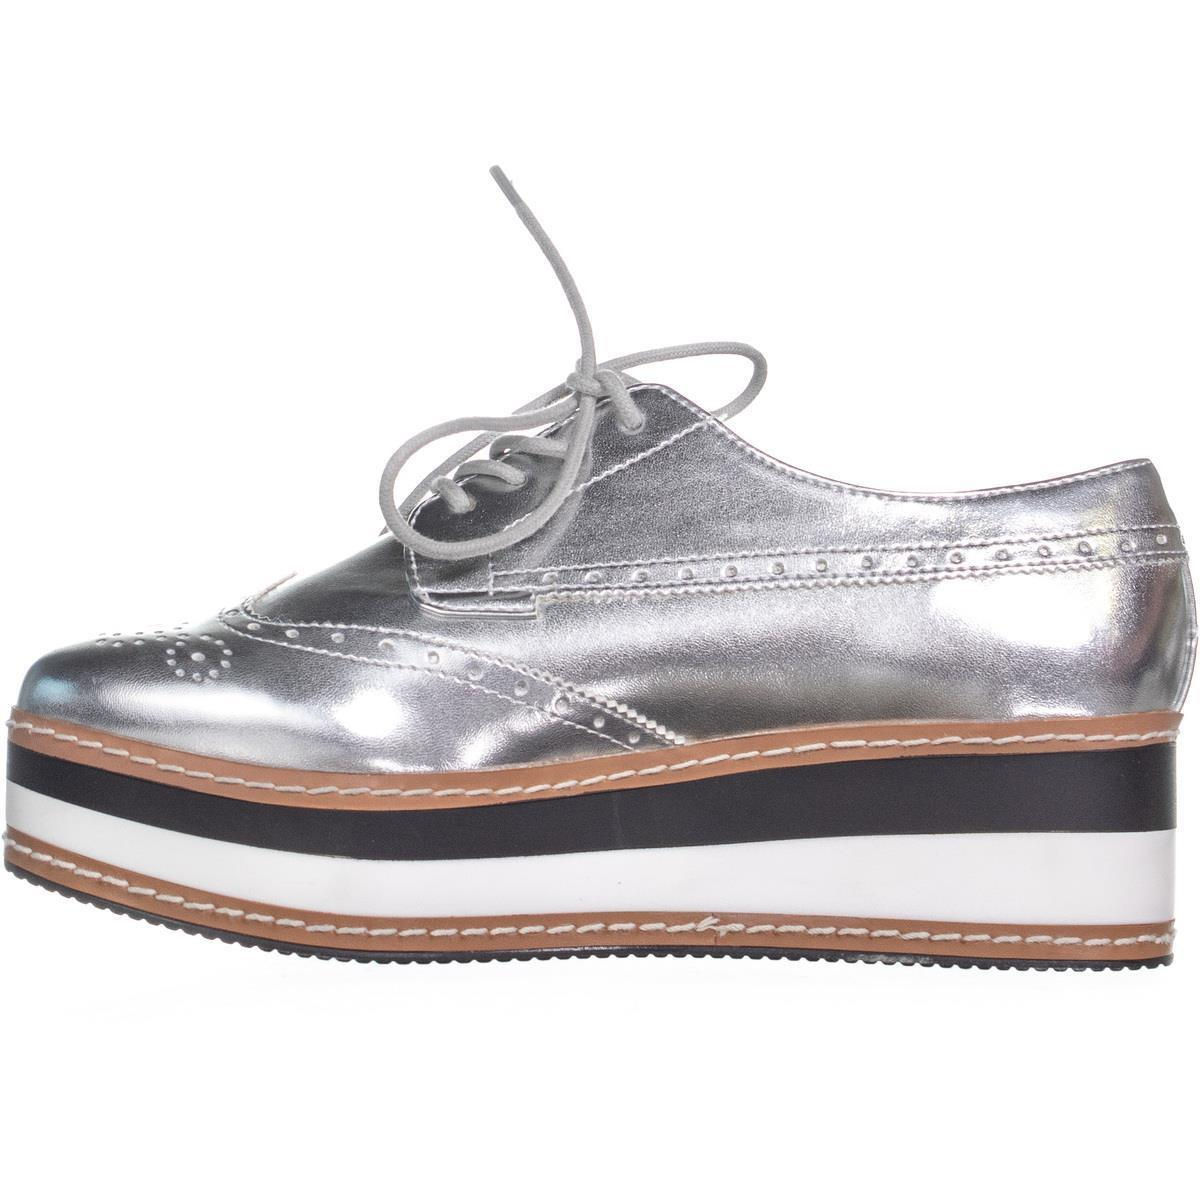 d17d9d4fd10 Lyst - Steve Madden Greco Lace Up Platform Sneakers